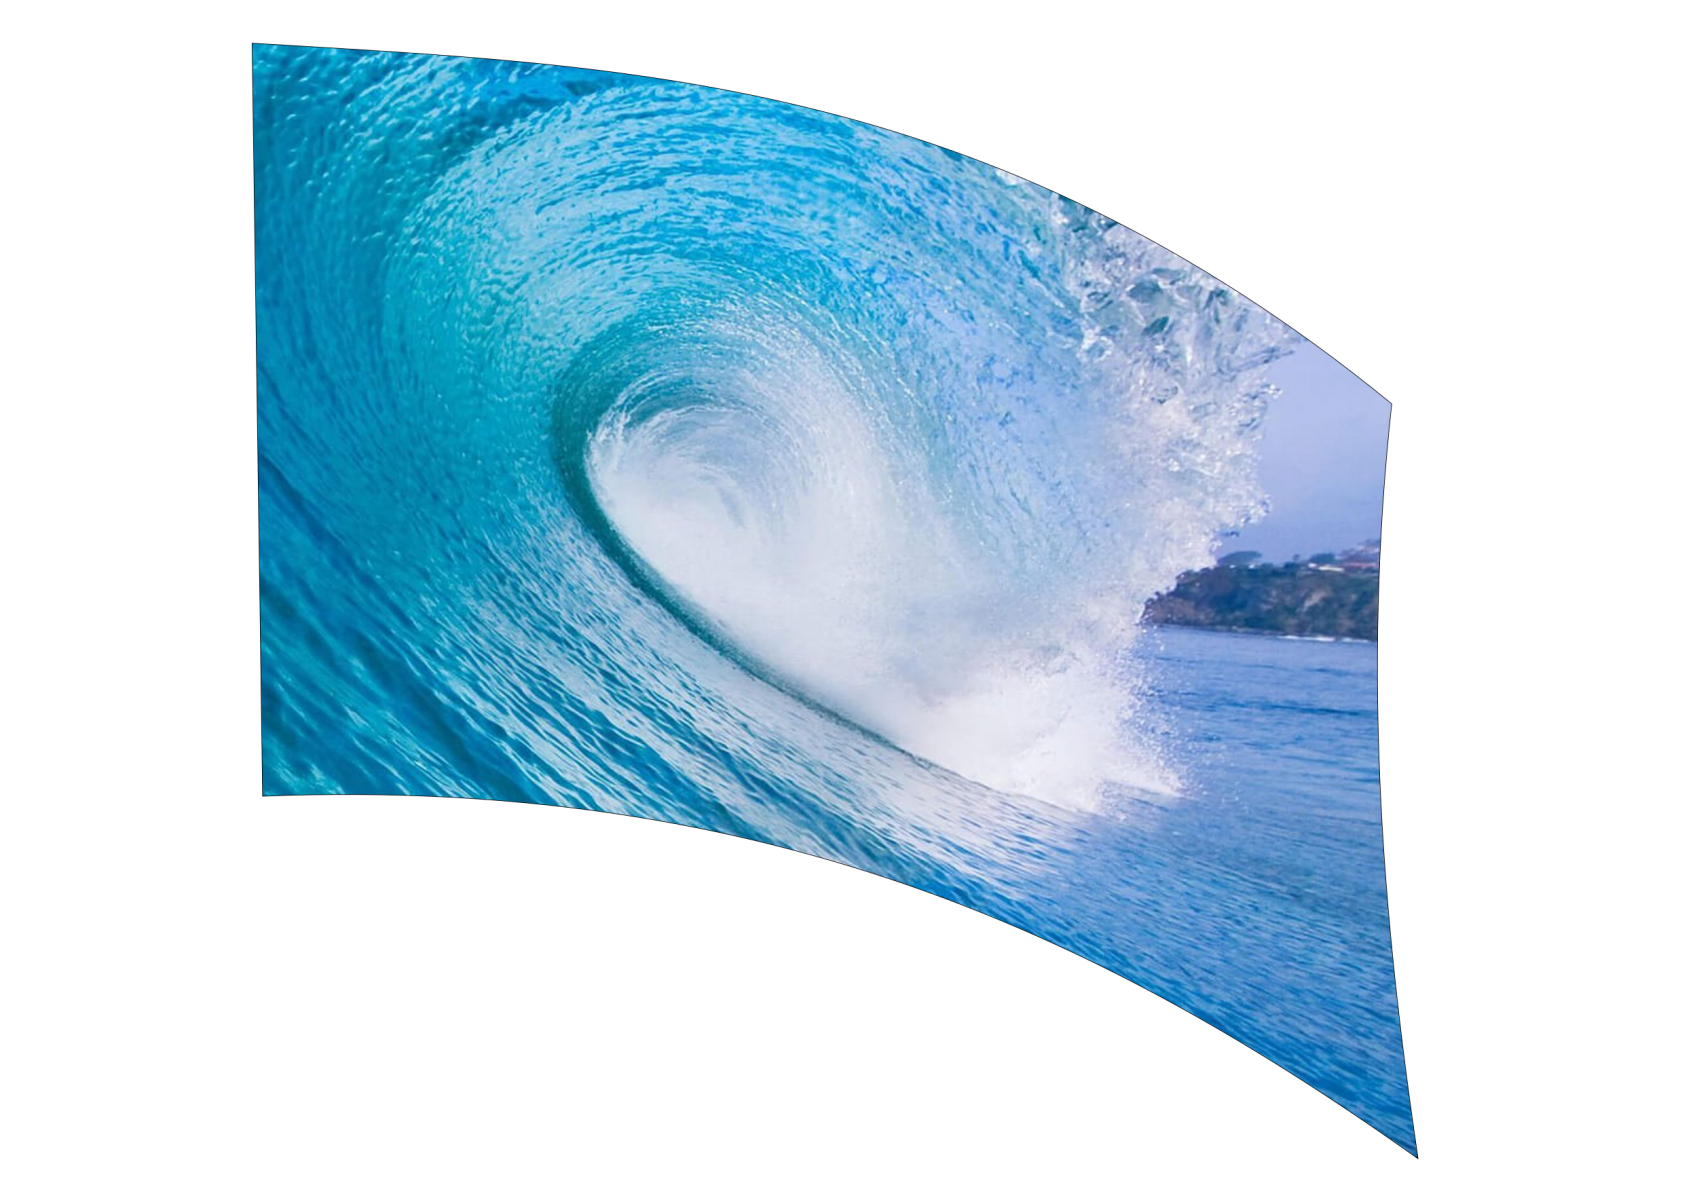 040302s - 36x54 Standard Tidal Wave 2